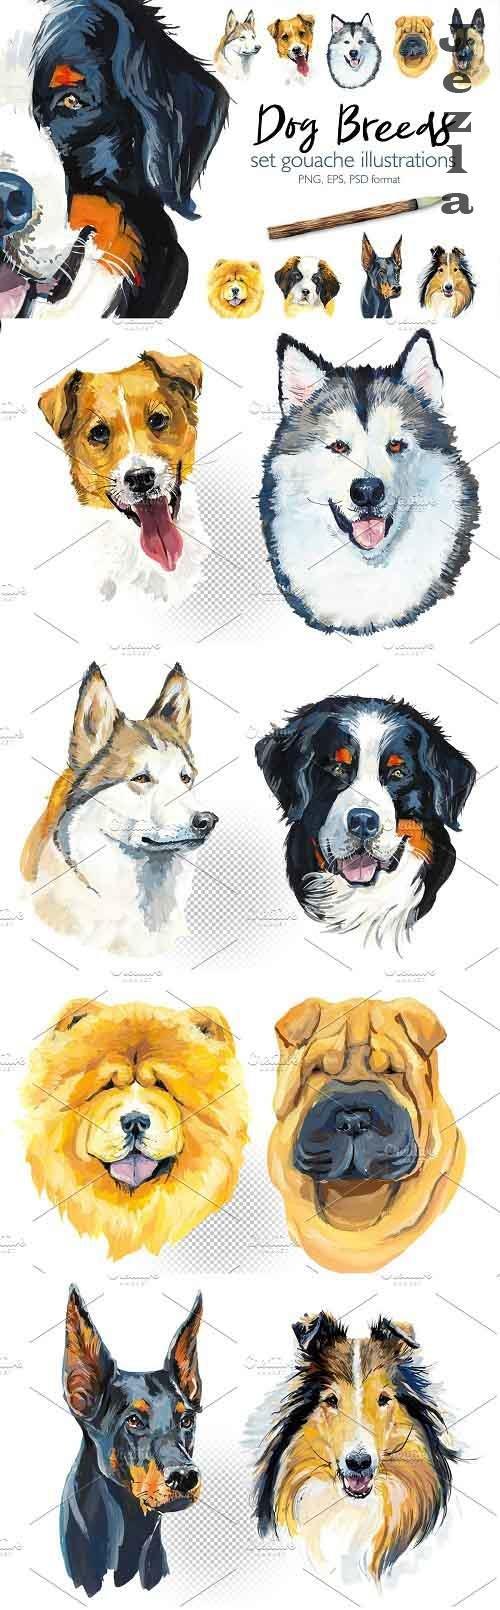 Dog breeds - 3716953